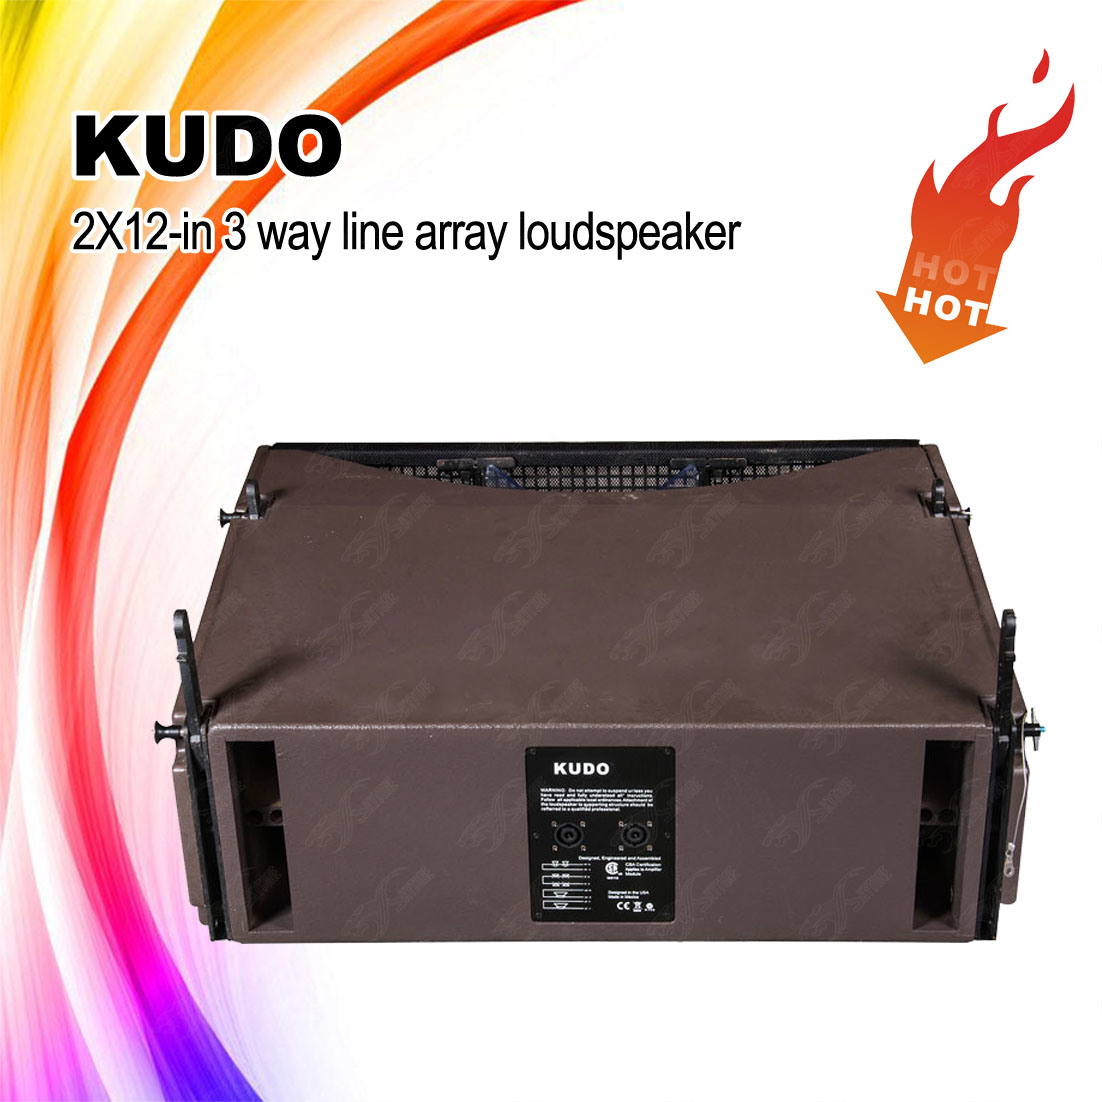 Kudo Dual 12 Inch Line Array Professional Loudspeaker